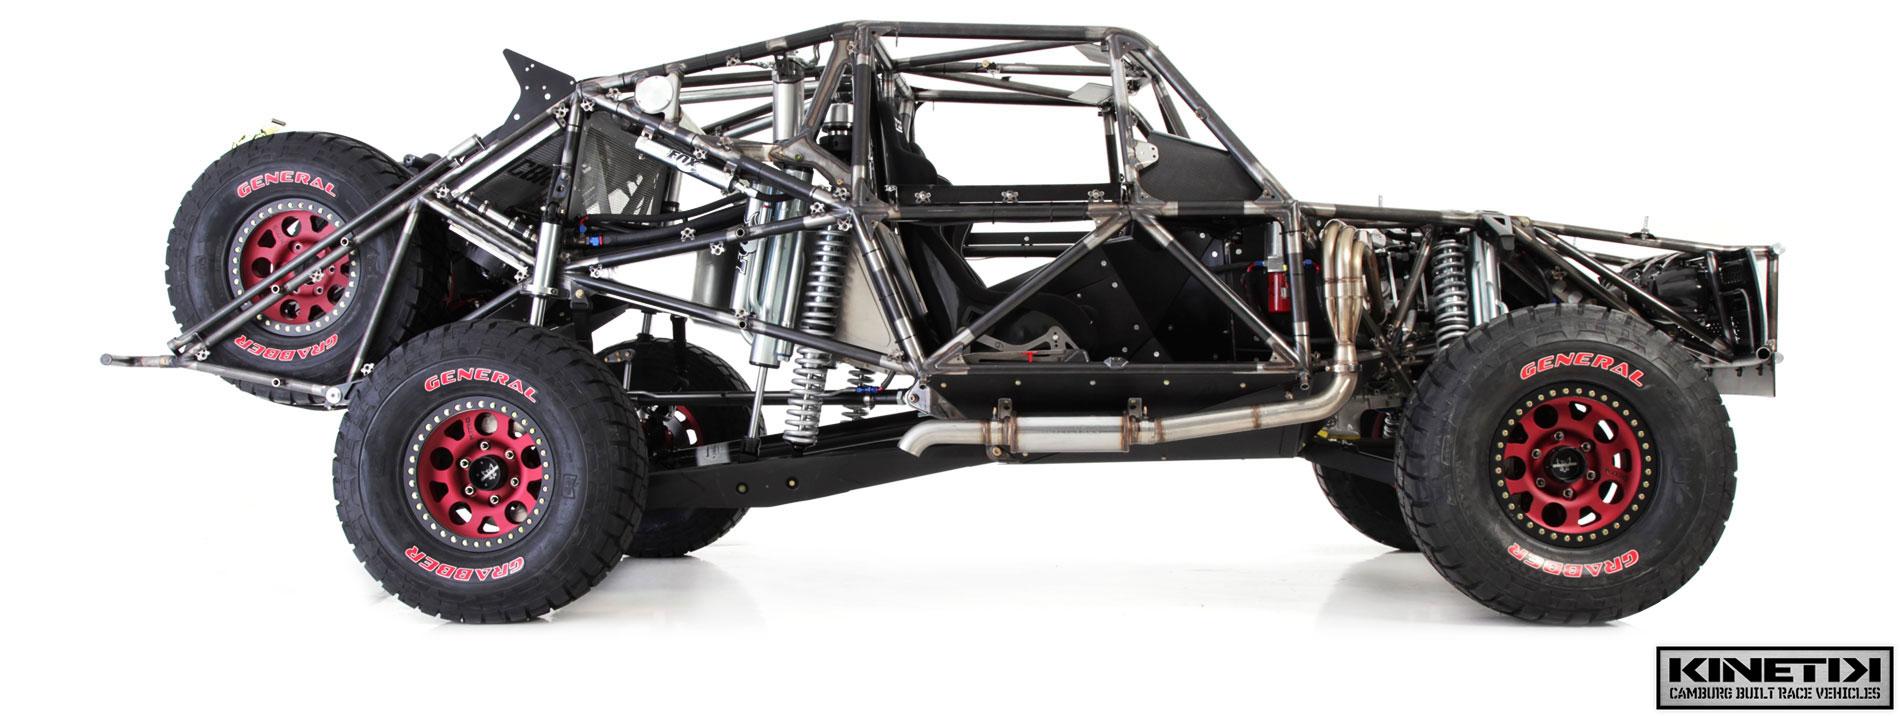 On Hold - * On Hold Indefinitely* Kinetik 6100 Trophy Truck | BeamNG